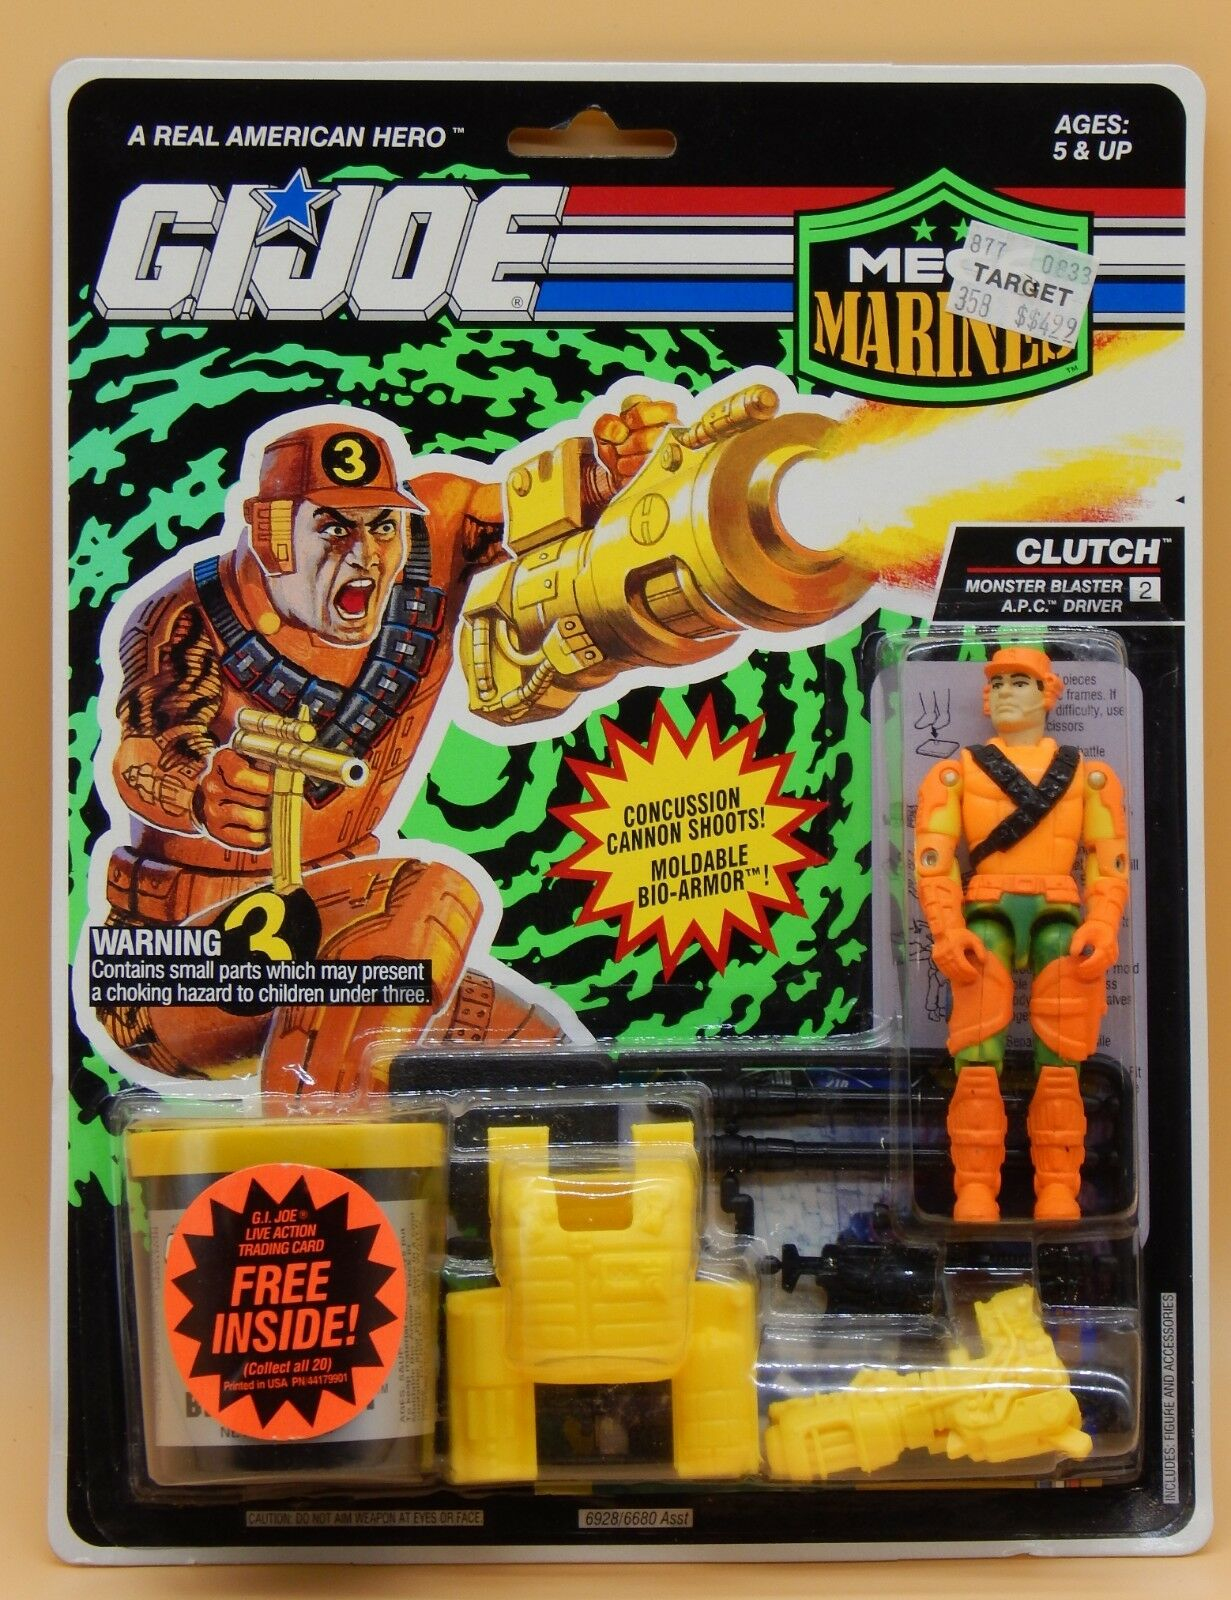 1993 GI Joe CLUTCH  vintage azione cifra MEGA MARINES w  Bio Armor Hasbro MOC     sport dello shopping online